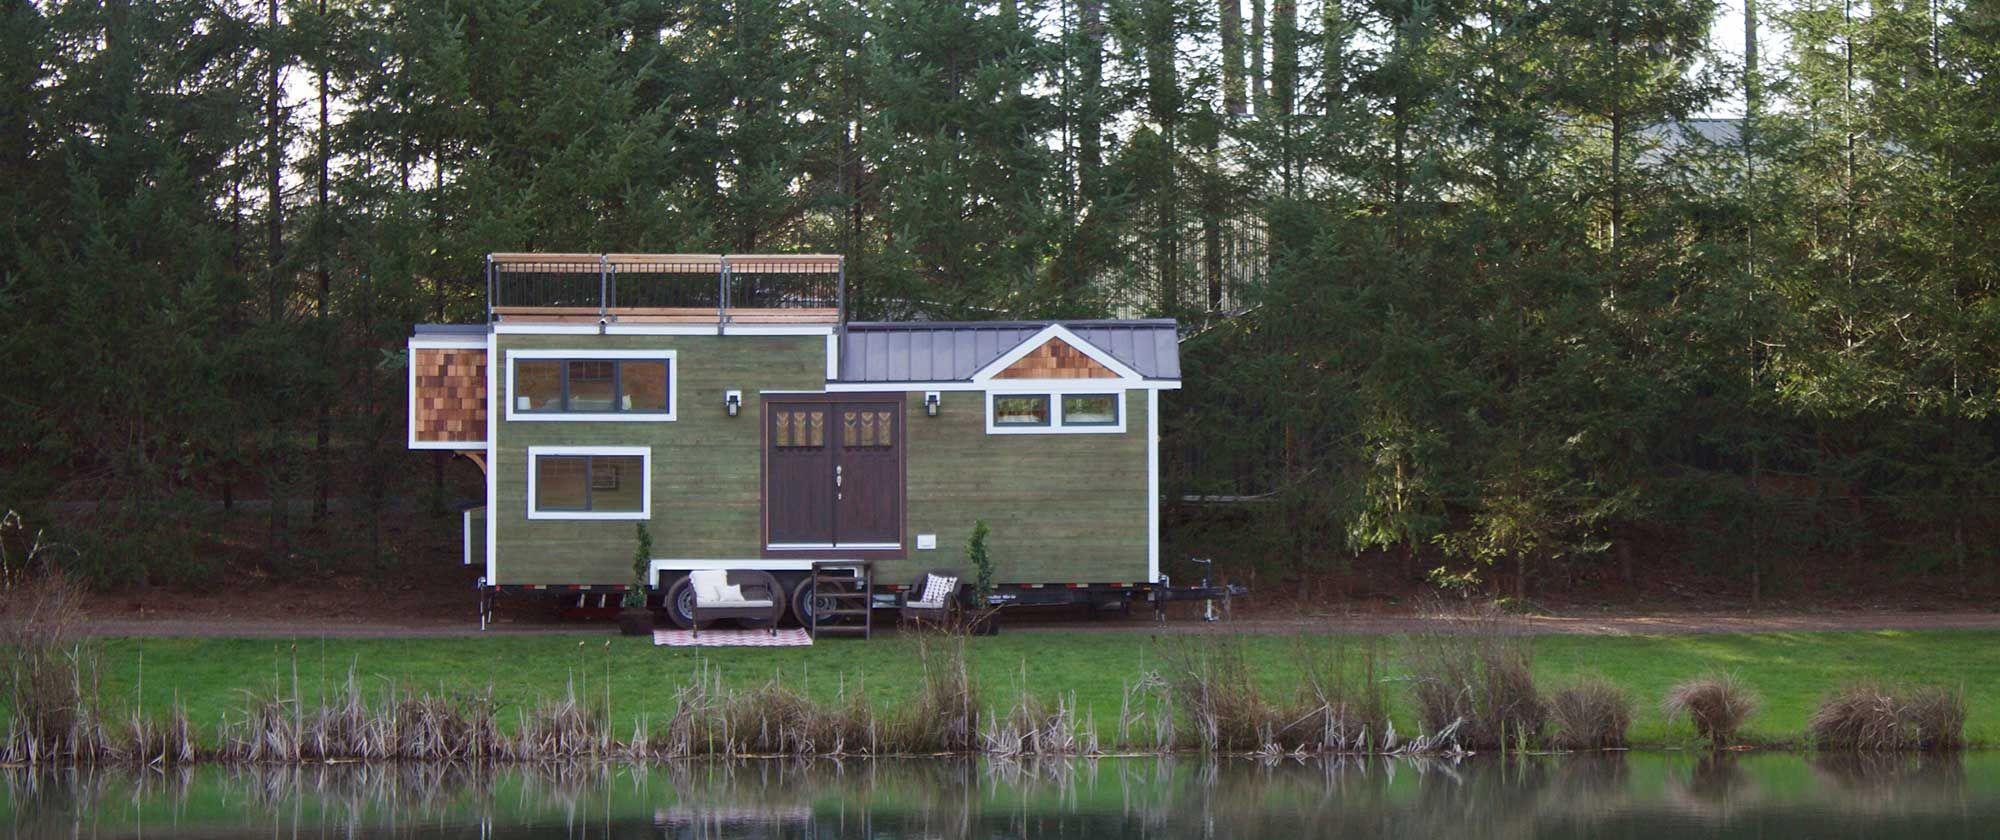 Tiny heirloom luxury custom tiny homes for sale home